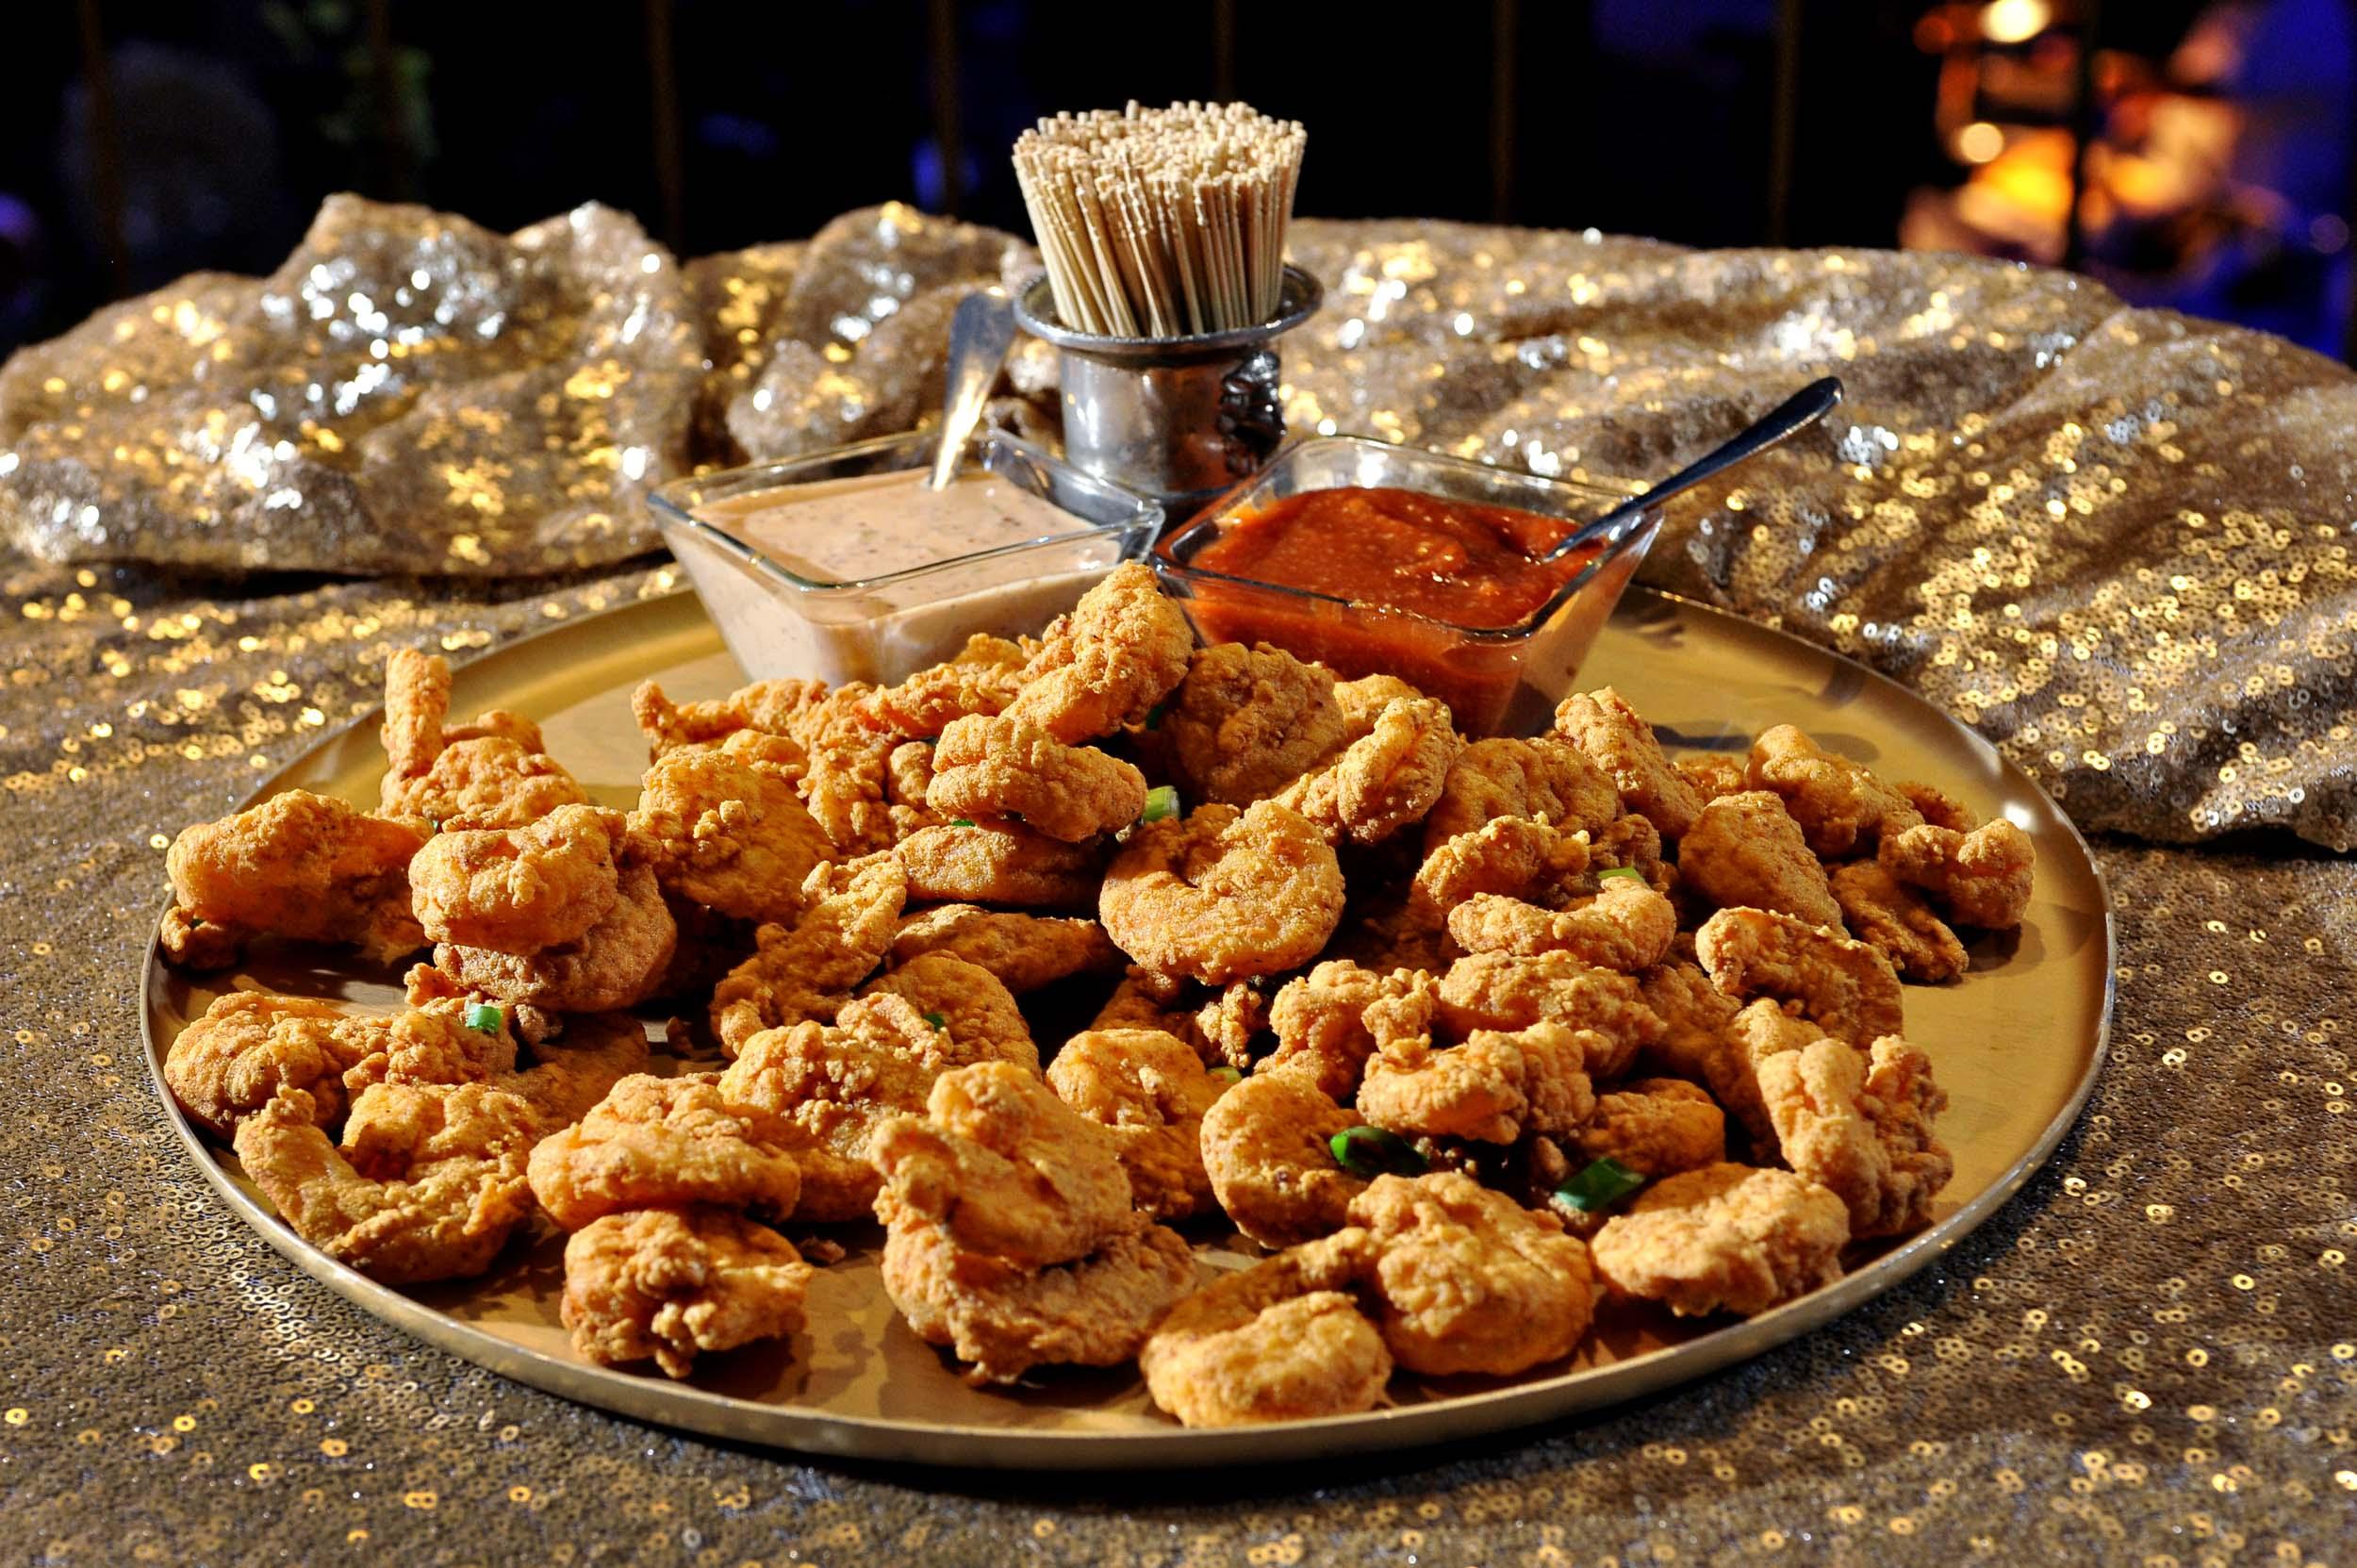 Louisiana Fried Shrimp (gluten-free)